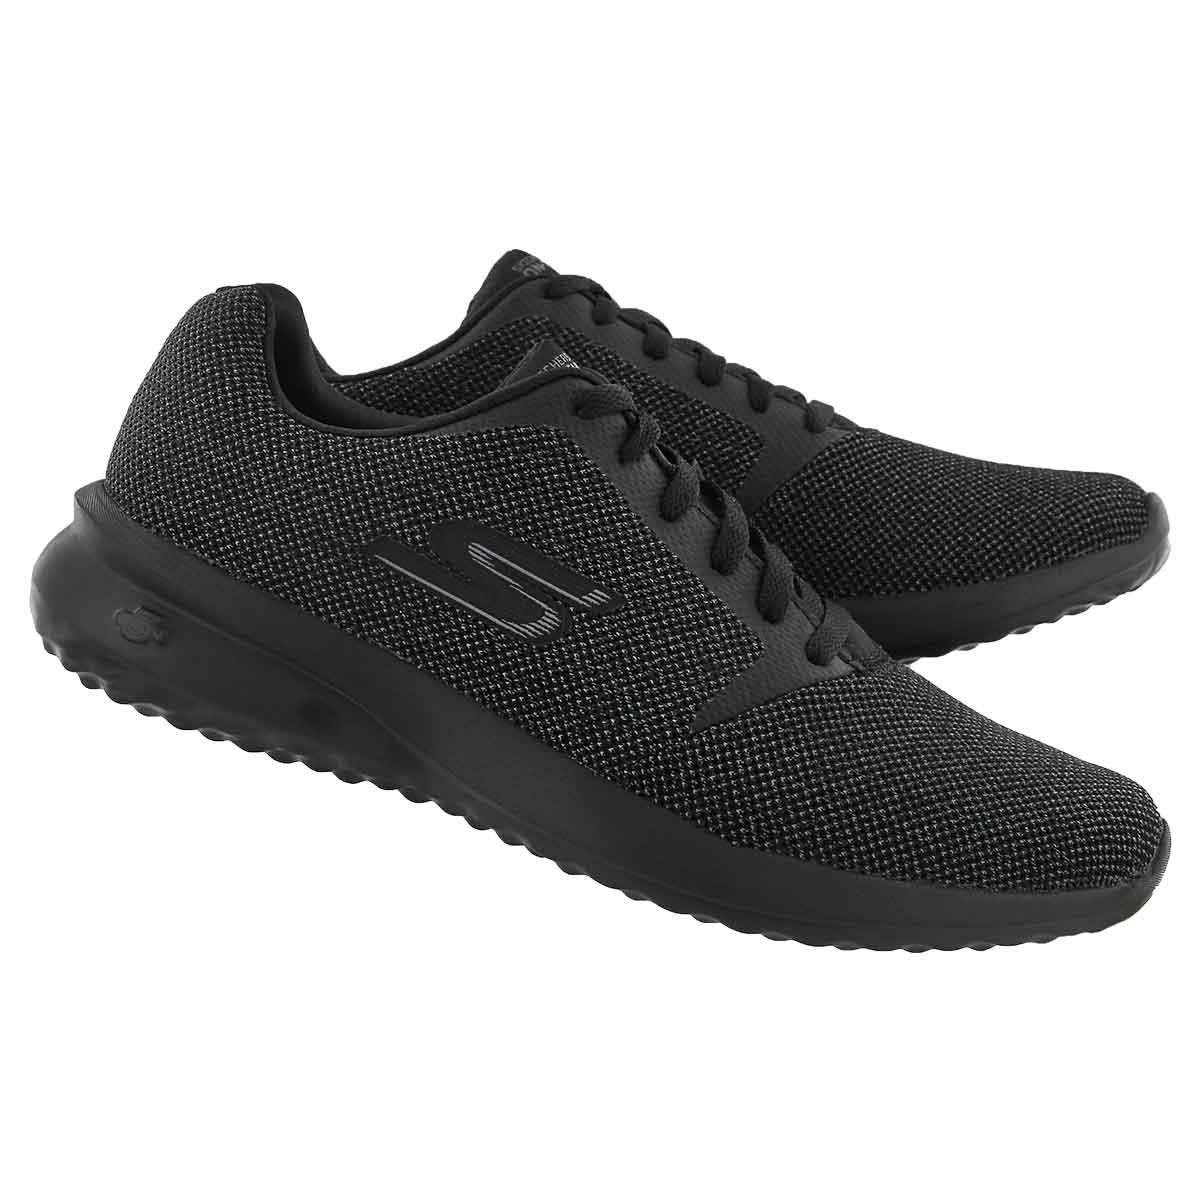 Mns OnTheGo City3.0 blk running shoe